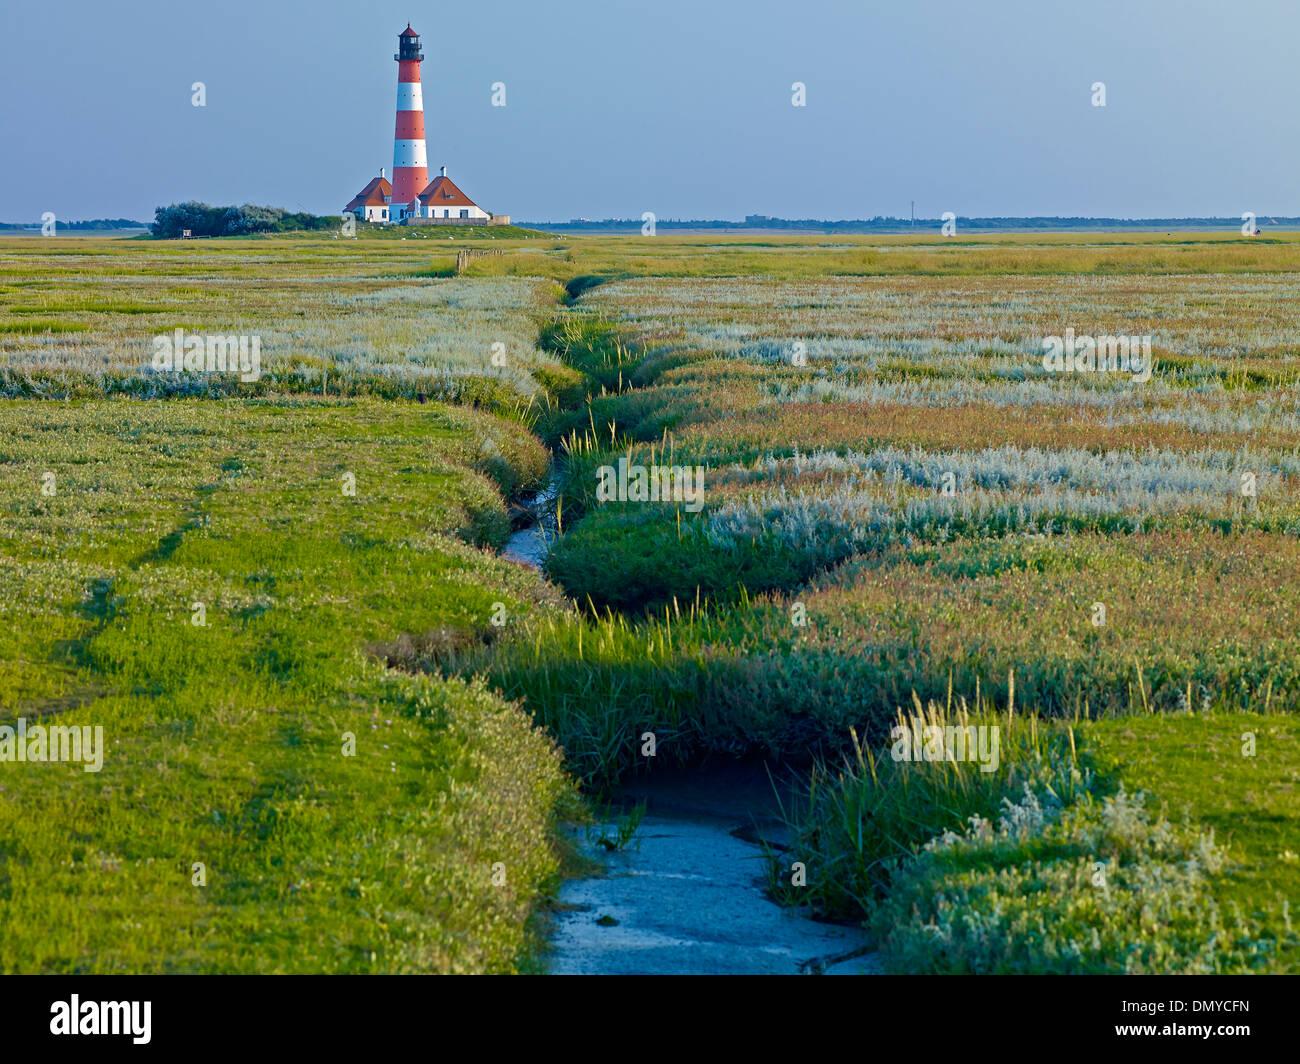 Faro Westerheversand, penisola di Eiderstedt, Frisia settentrionale, Schleswig-Holstein, Germania Immagini Stock